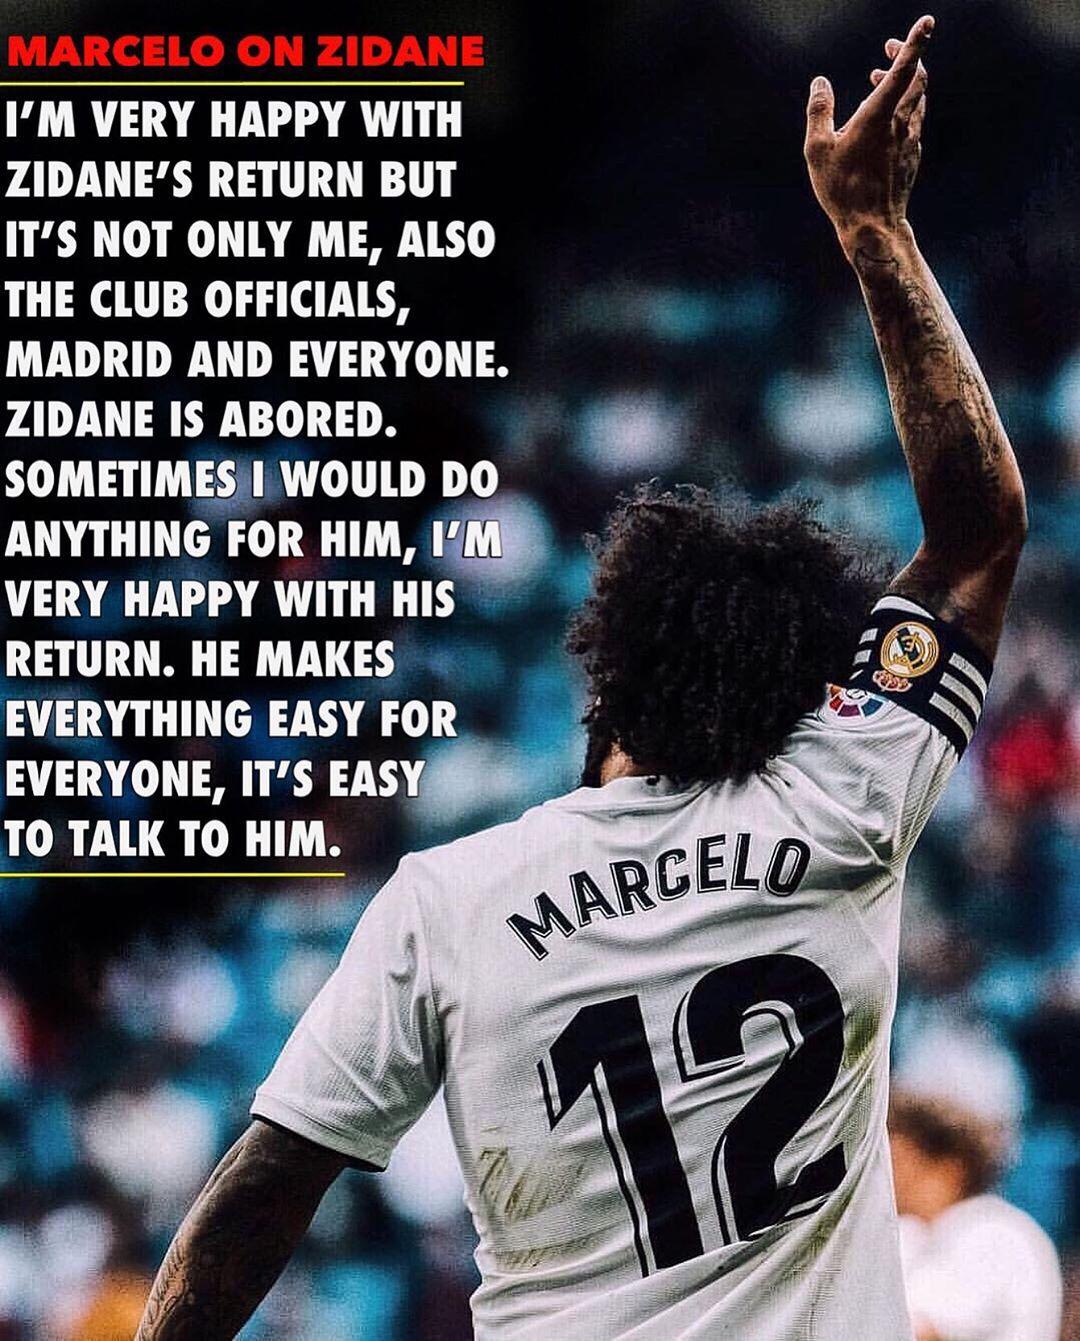 "Marcelo on Zidane: ""ไม่เพียง แต่เขาเป็นอดีตผู้เล่นเท่านั้น แต่เขายังดีที่สุด …"